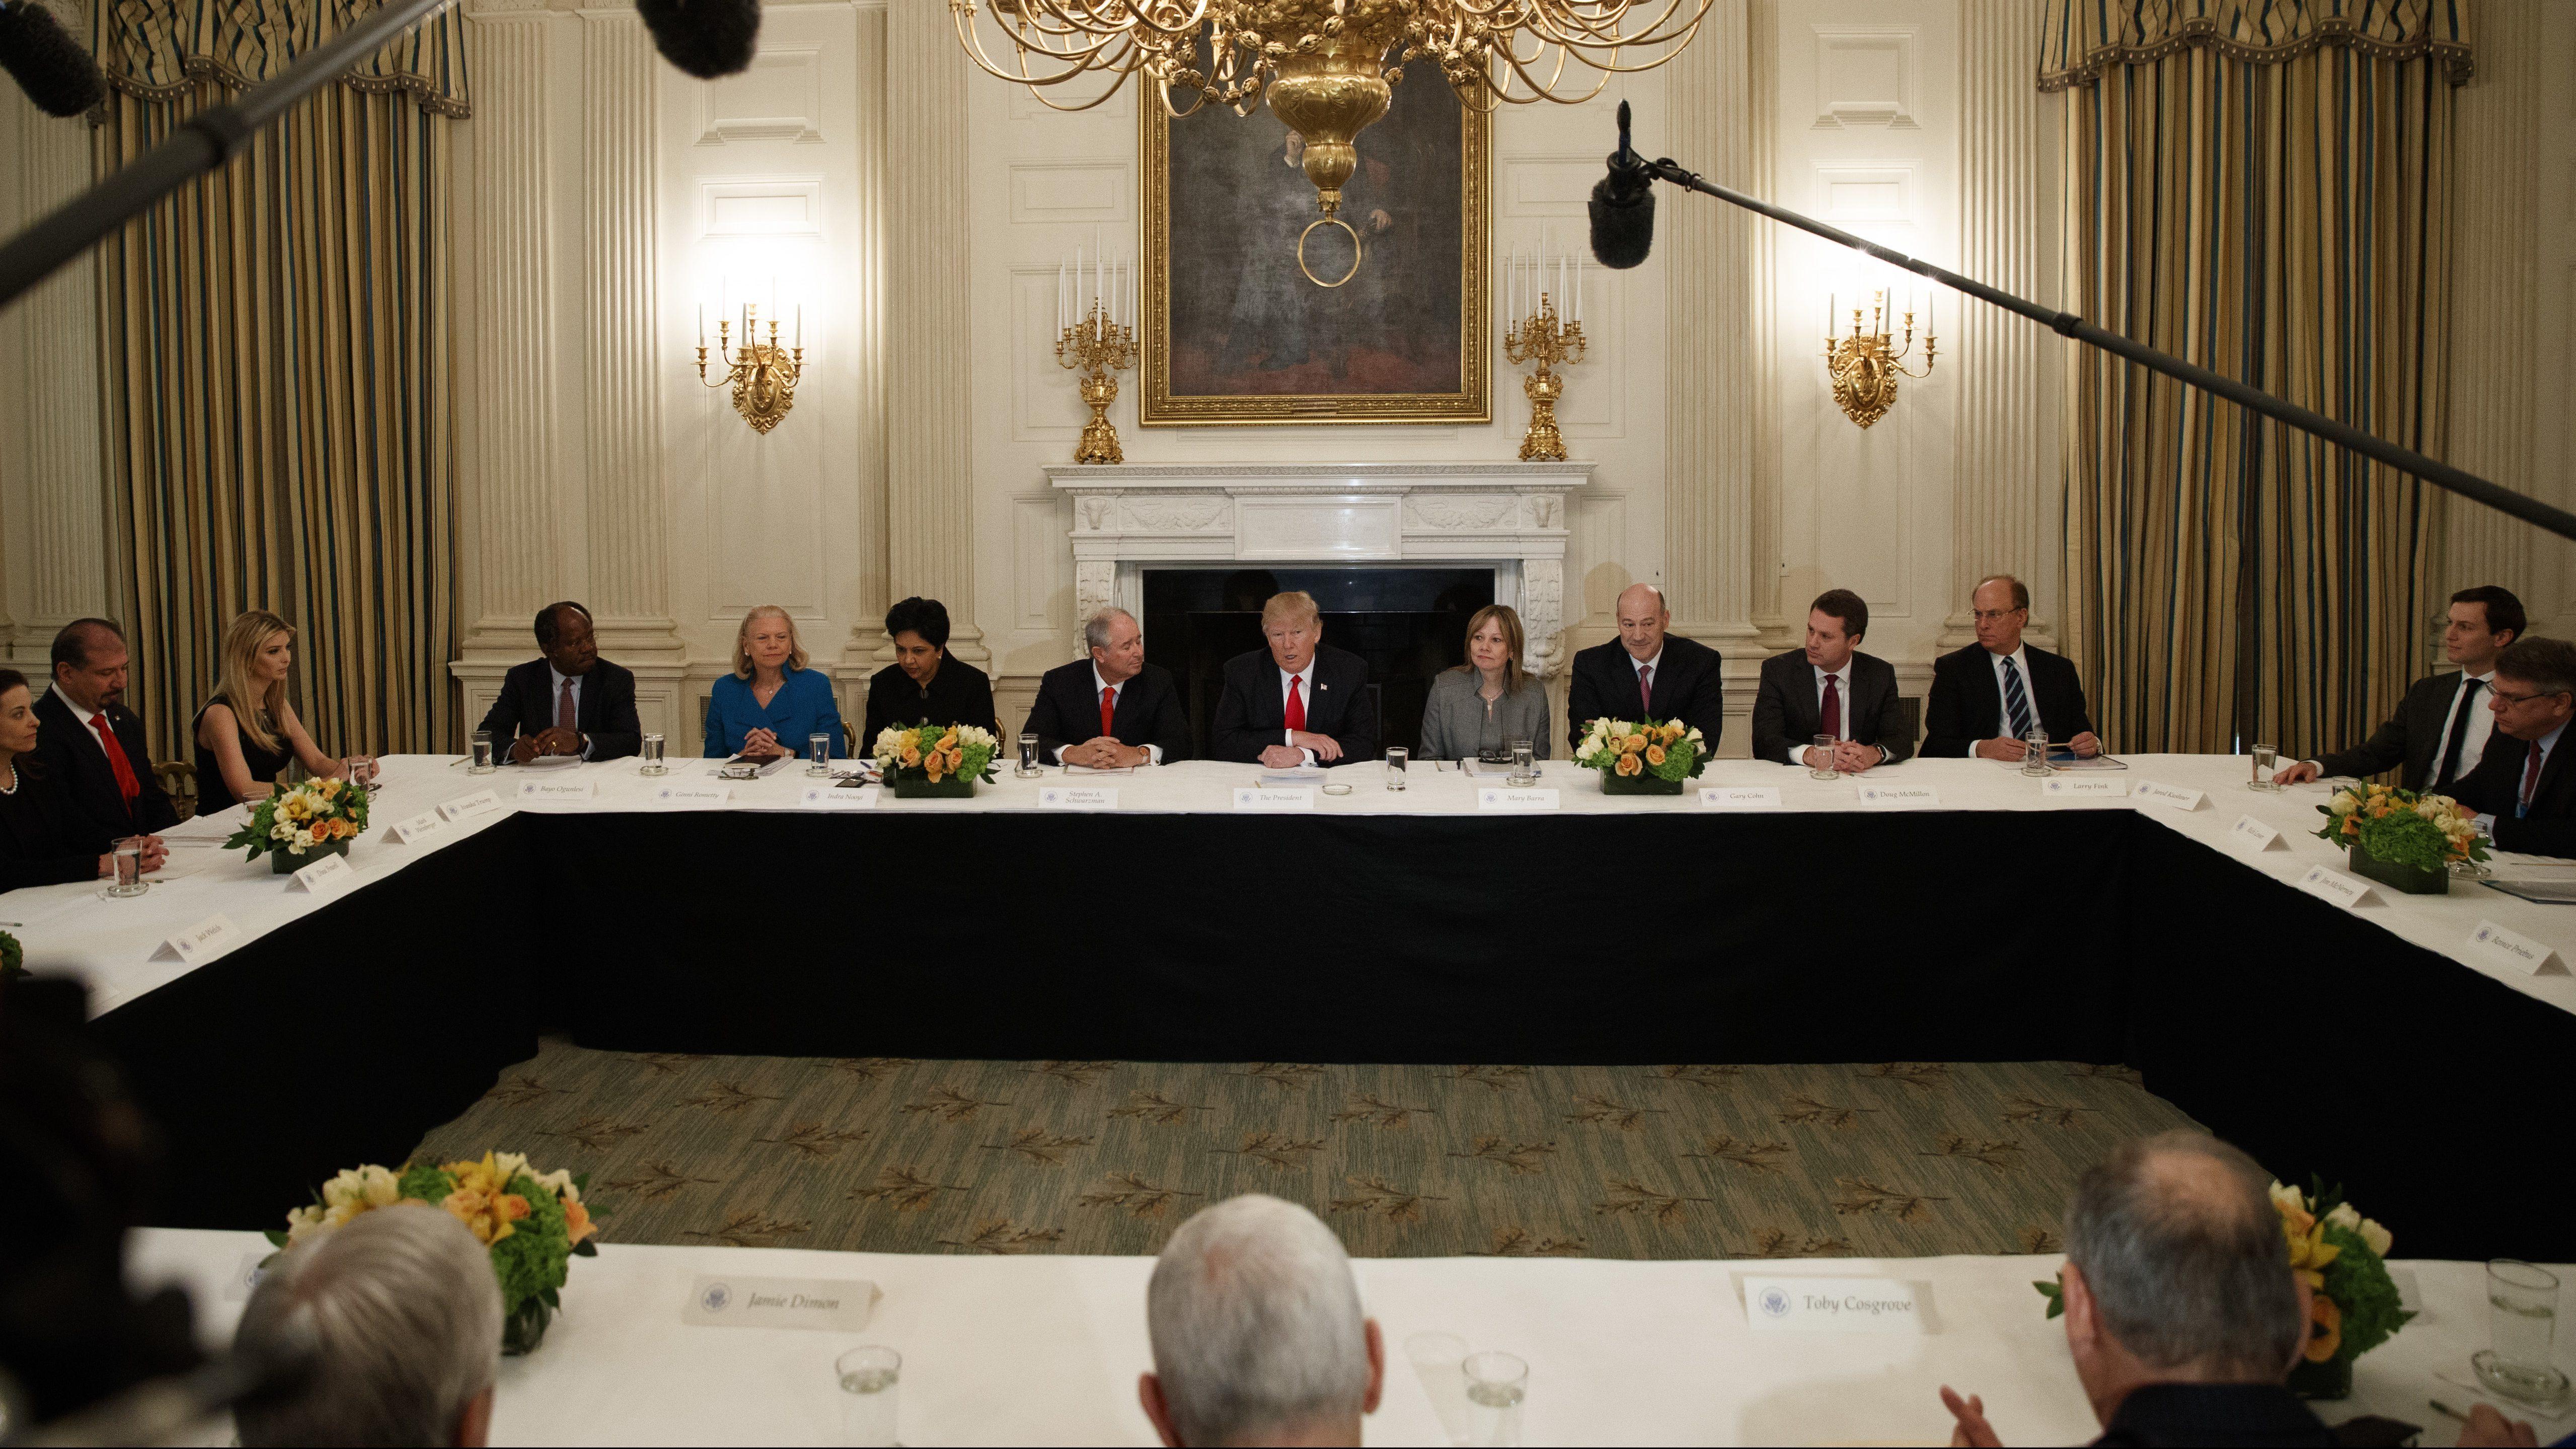 Trump's Business council, minus Uber